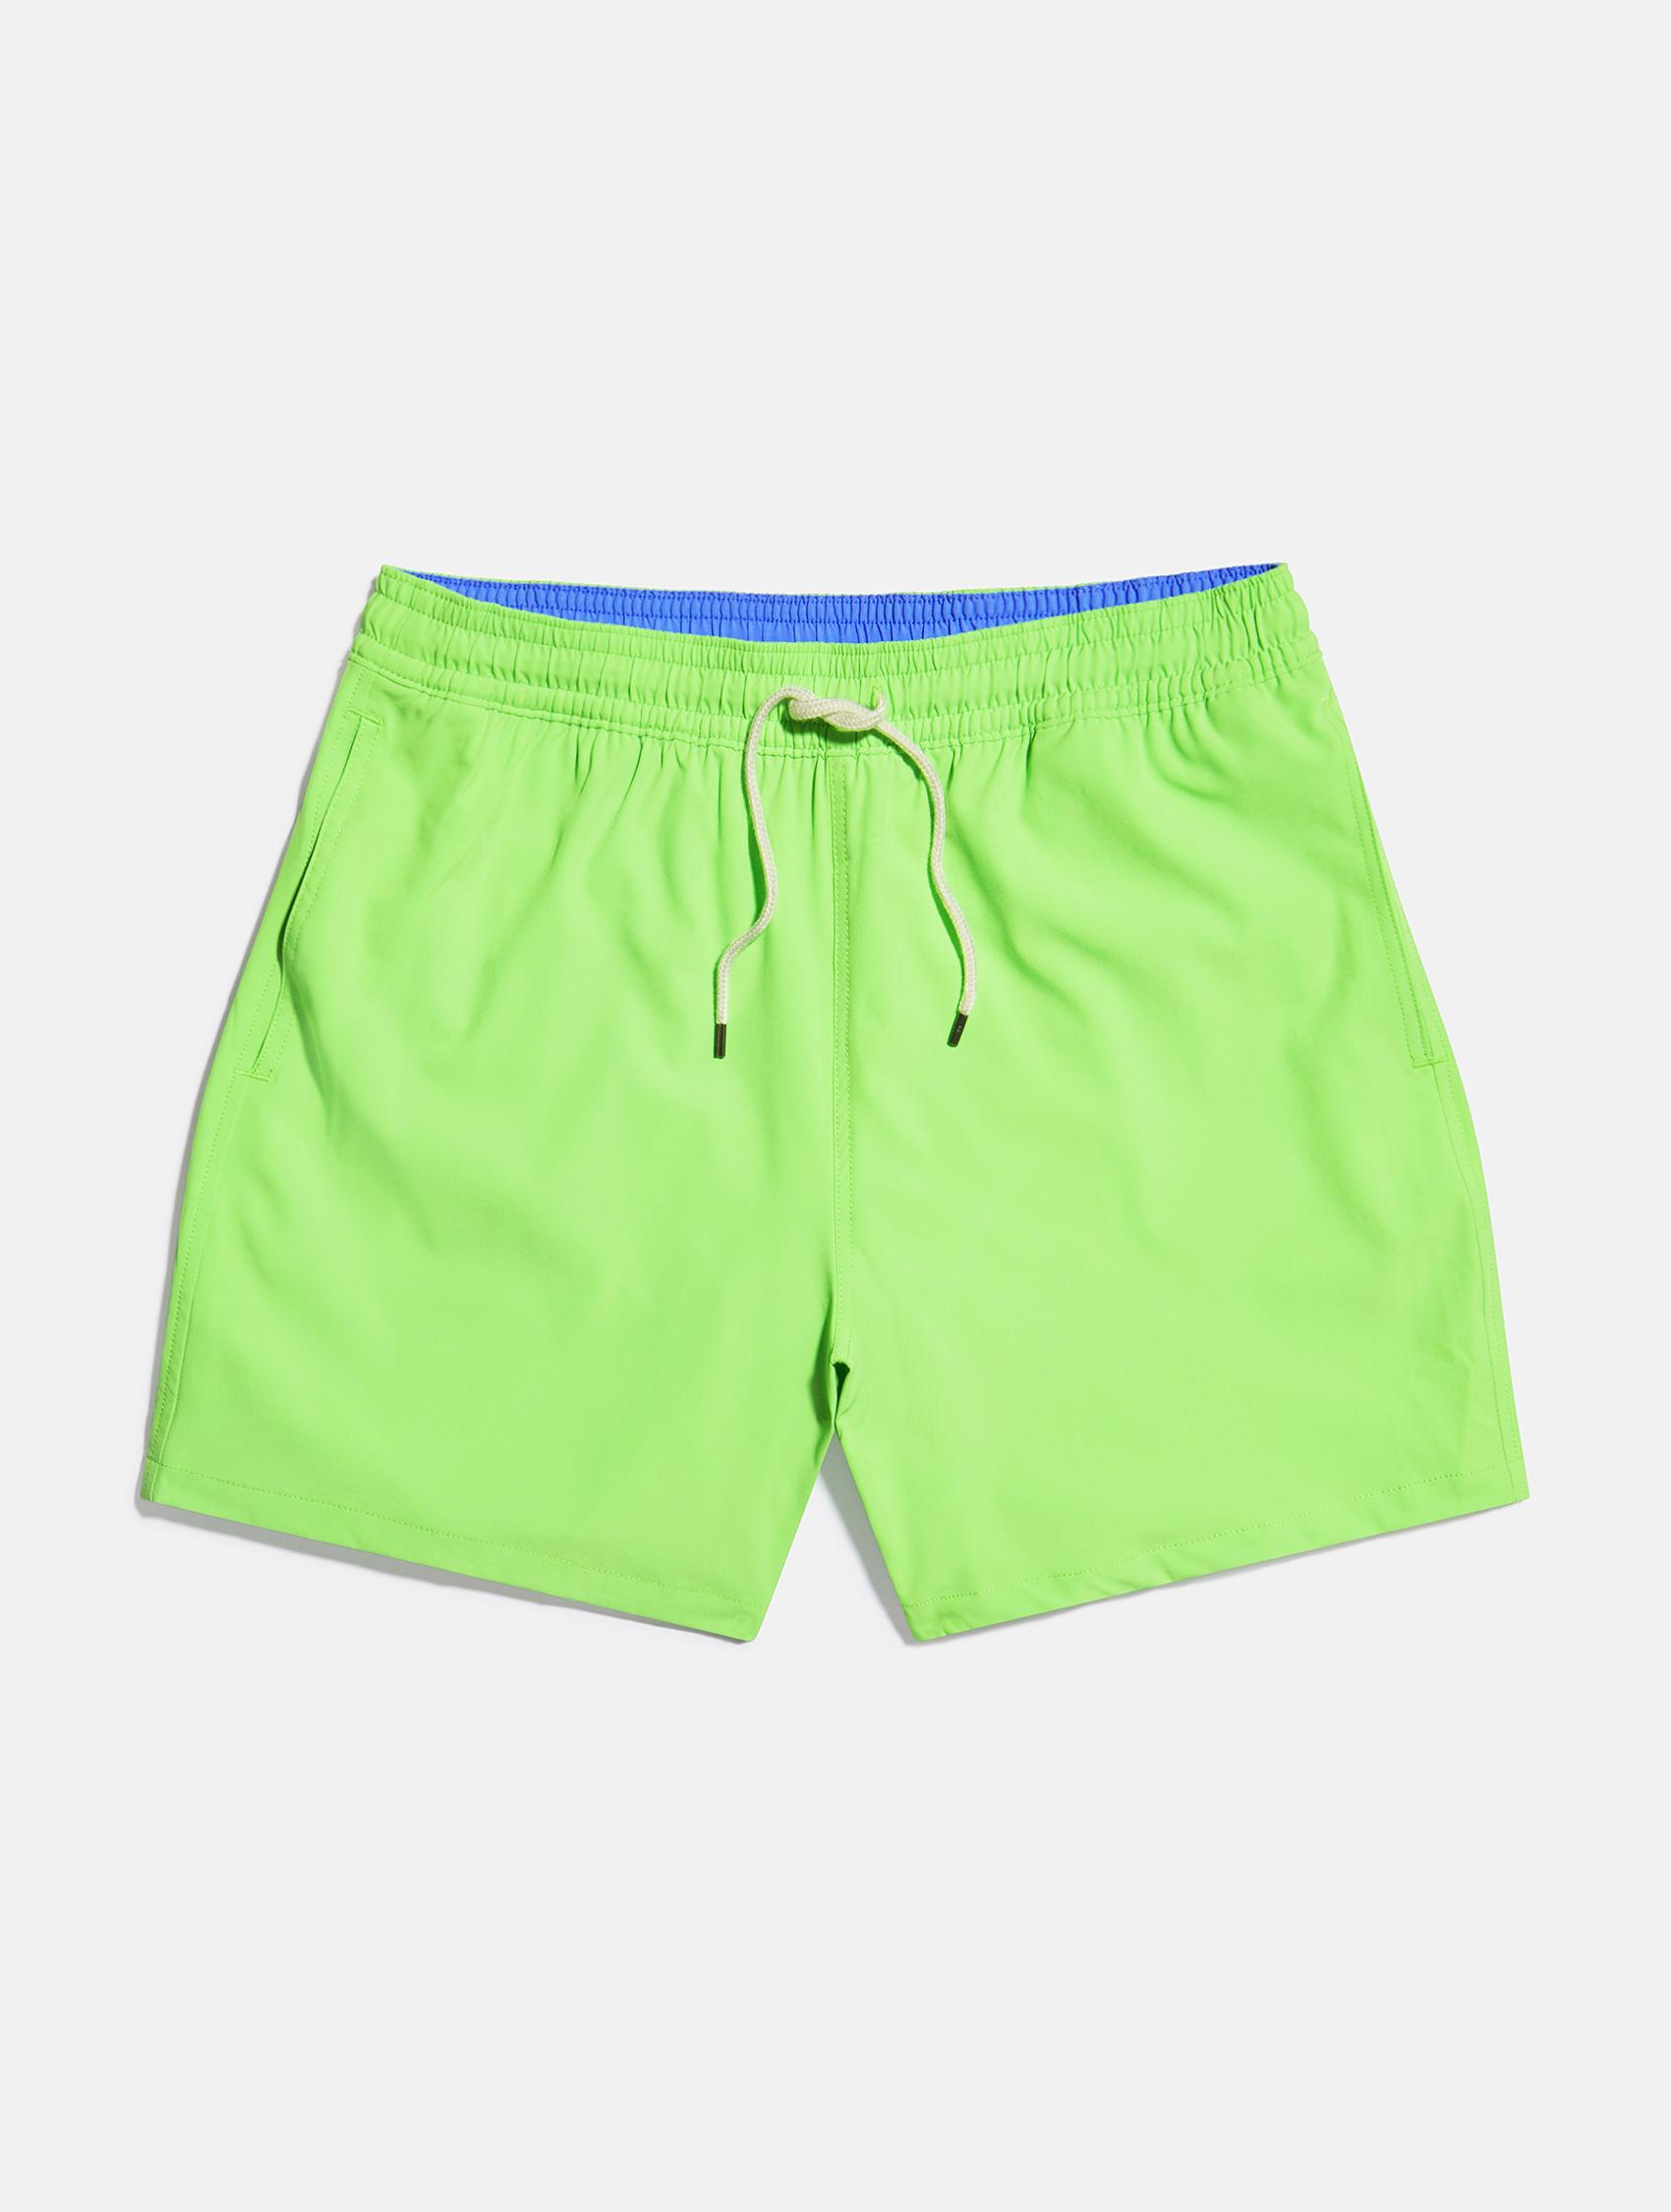 Light green with blue detailing Ralph Lauren swimming shorts